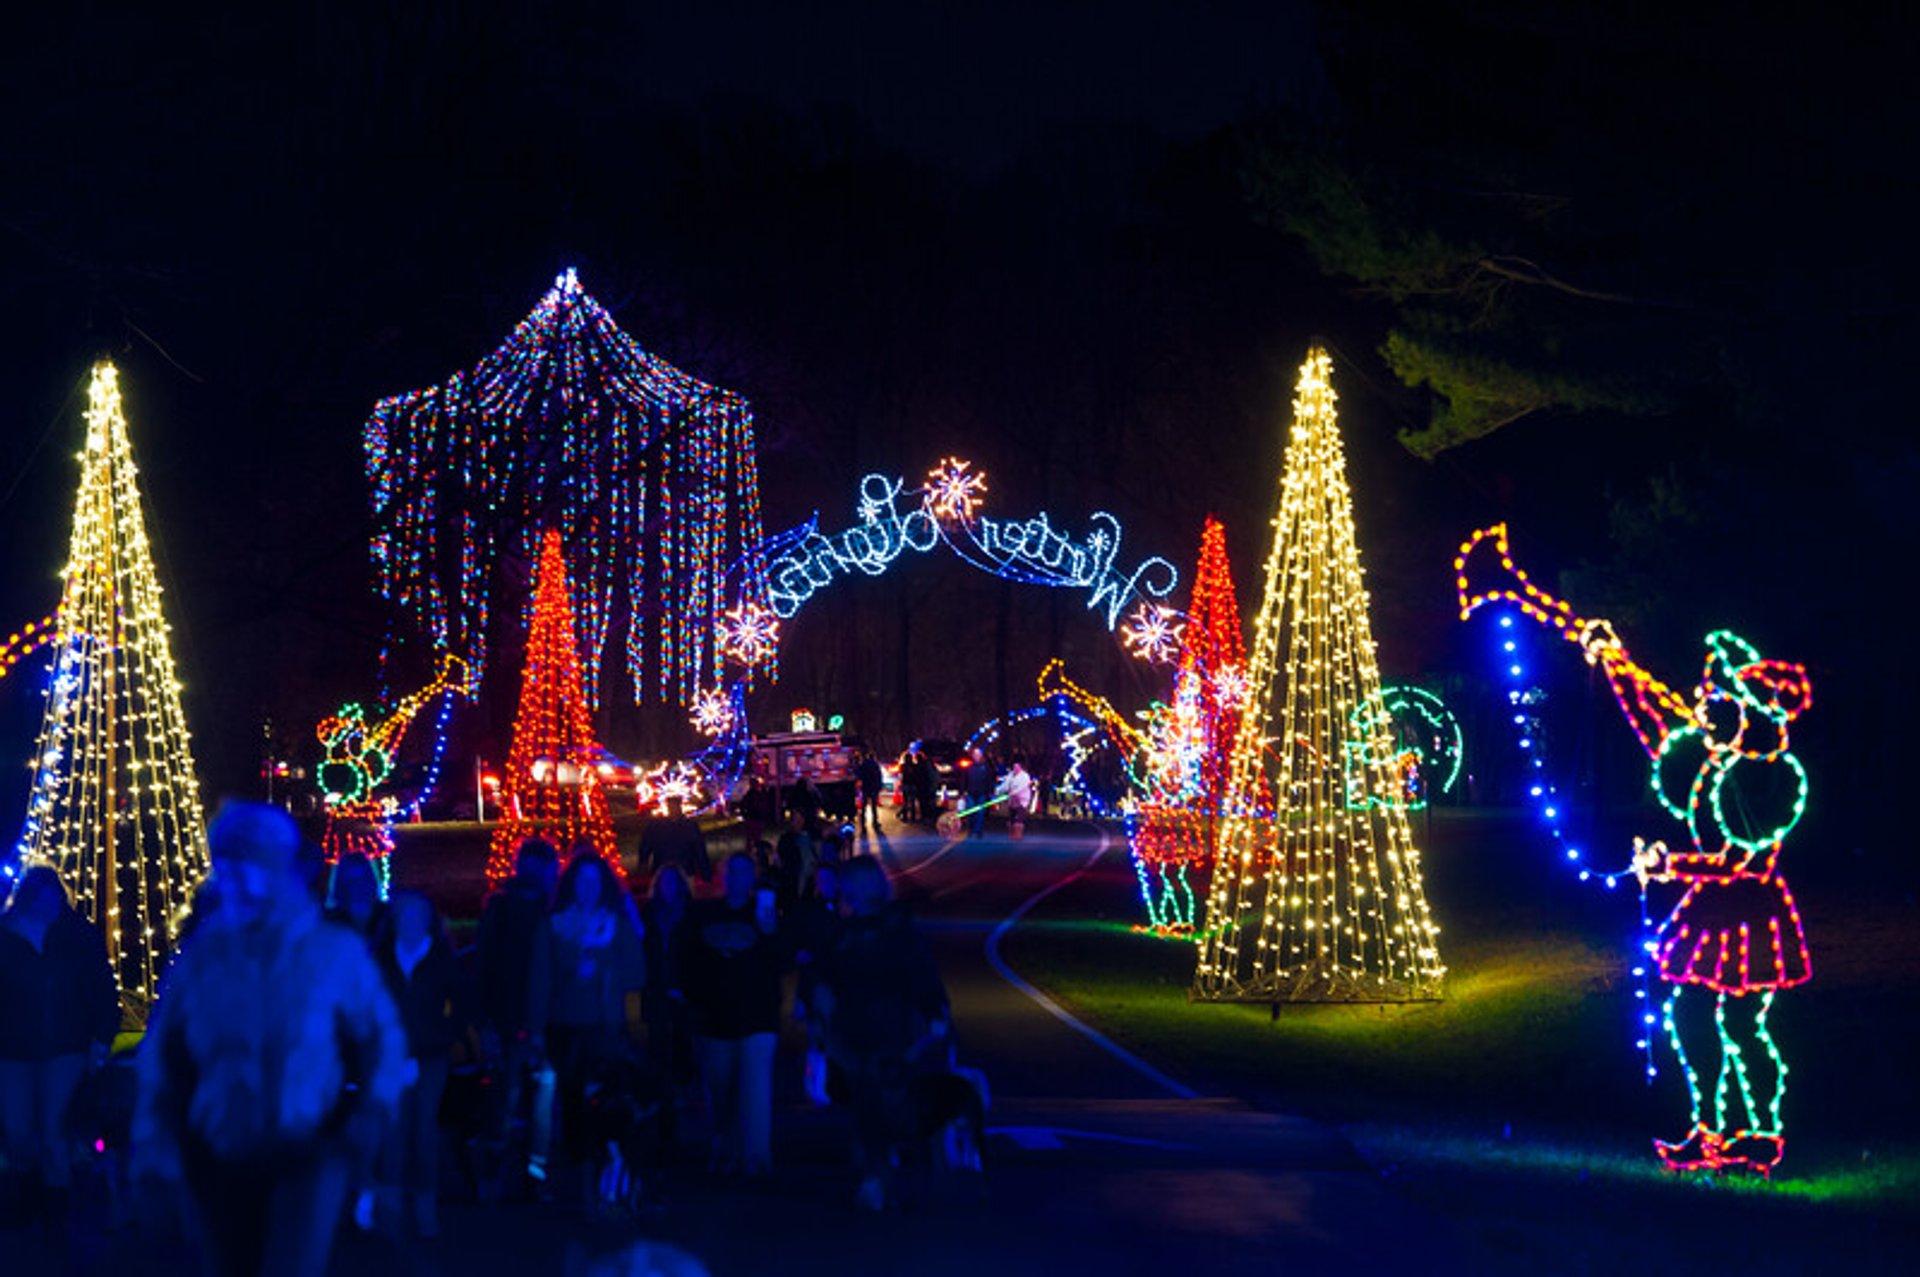 Gaithersburg Winter Lights Festival 2020